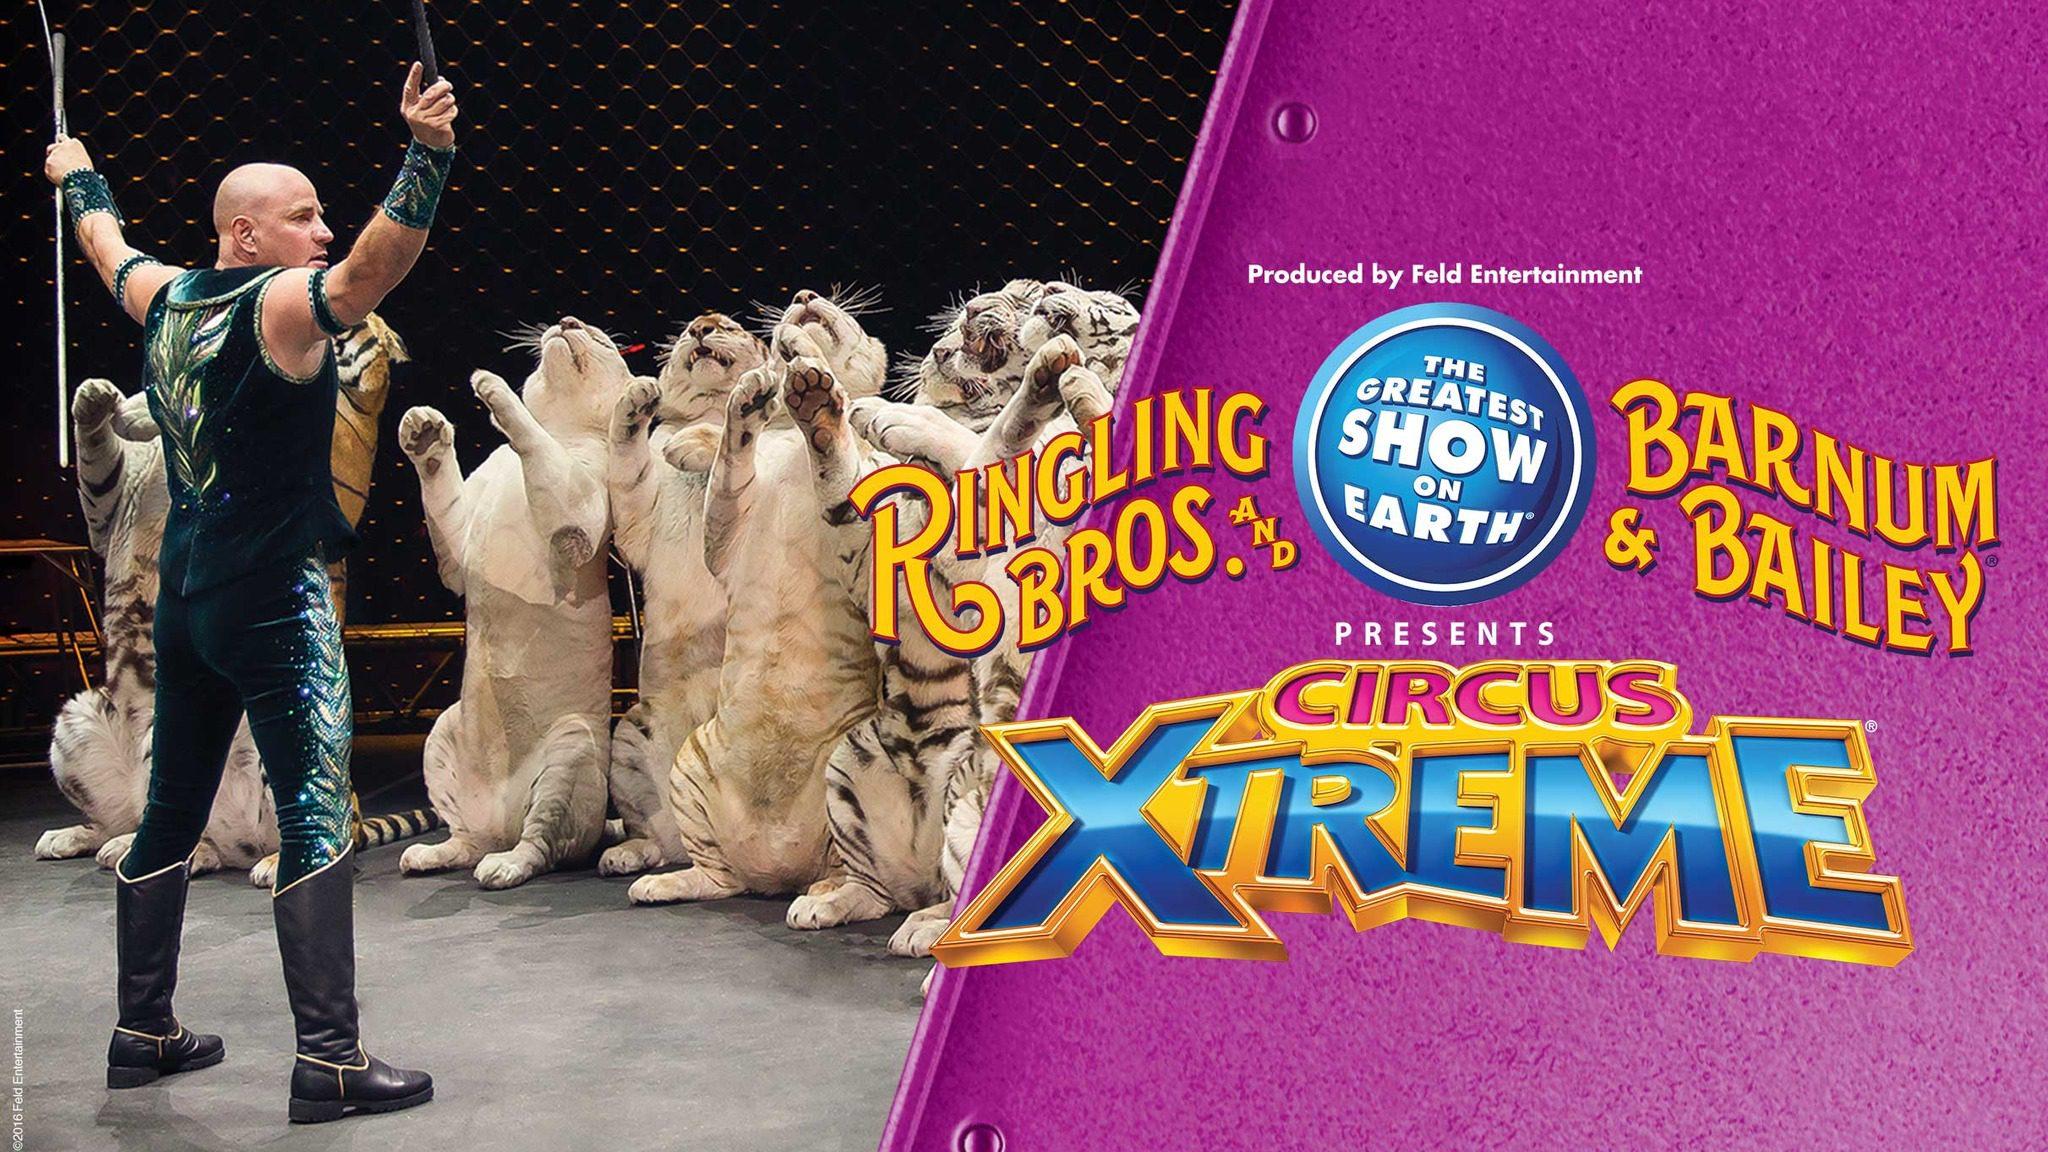 Jan. 25-29 Ringling Bros. and Barnum & Bailey Presents Circus XTREME